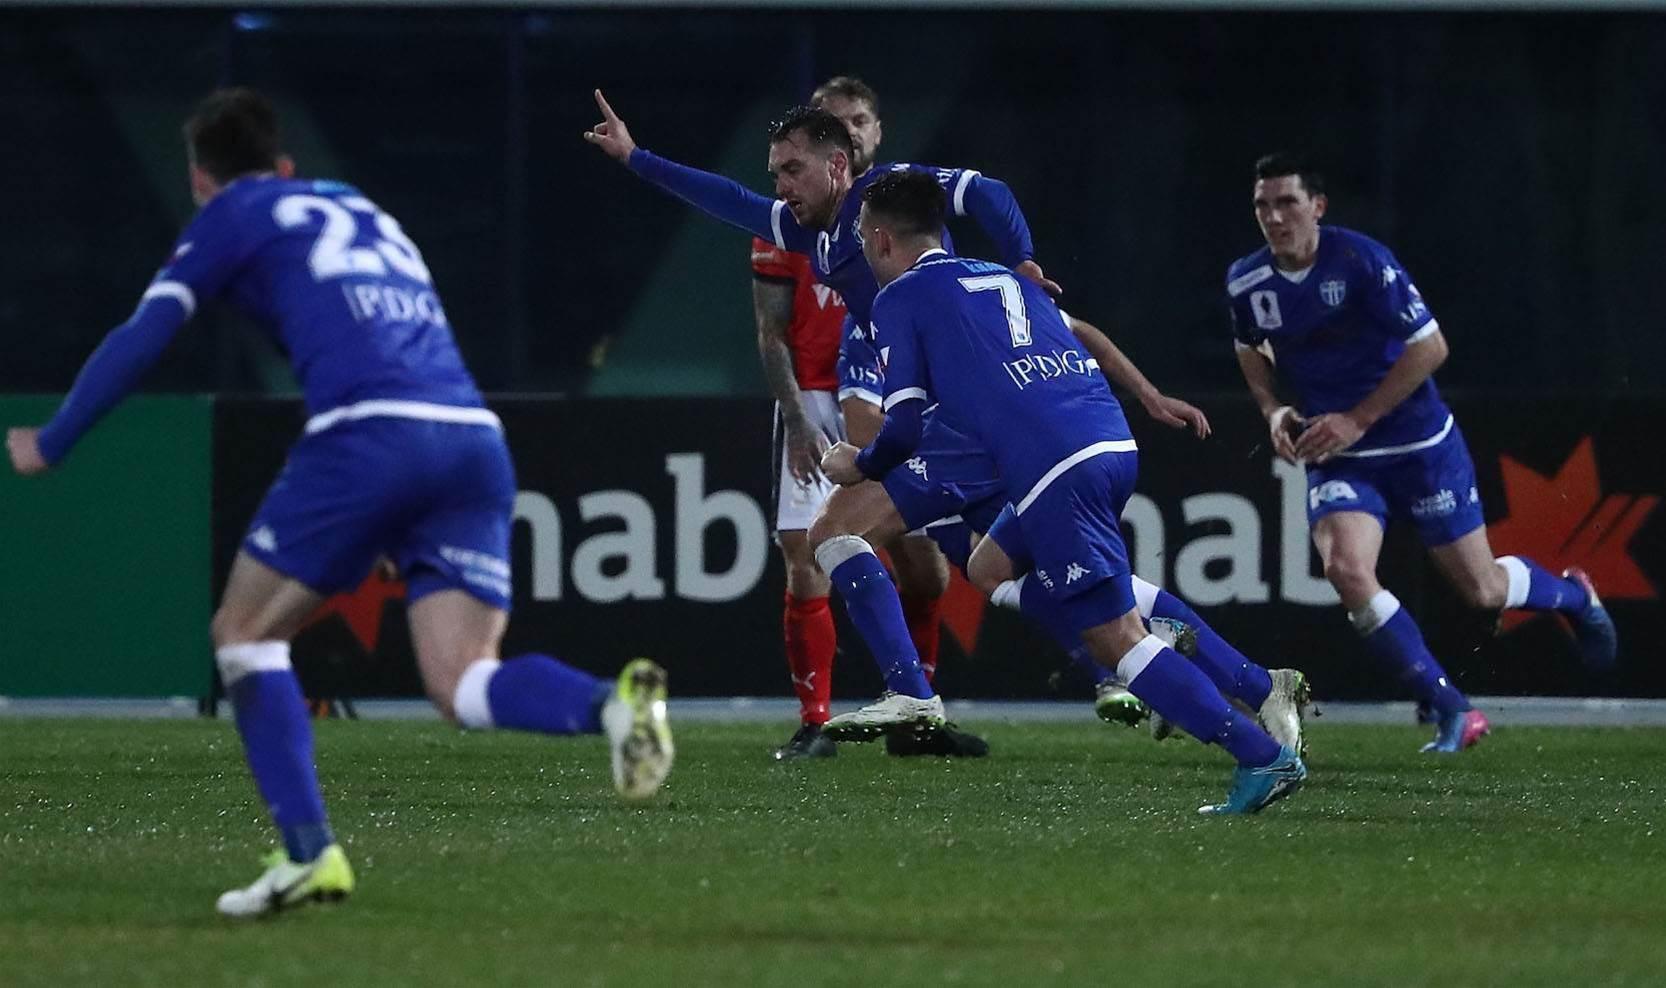 FFA Cup wrap: South net last-gasp winner